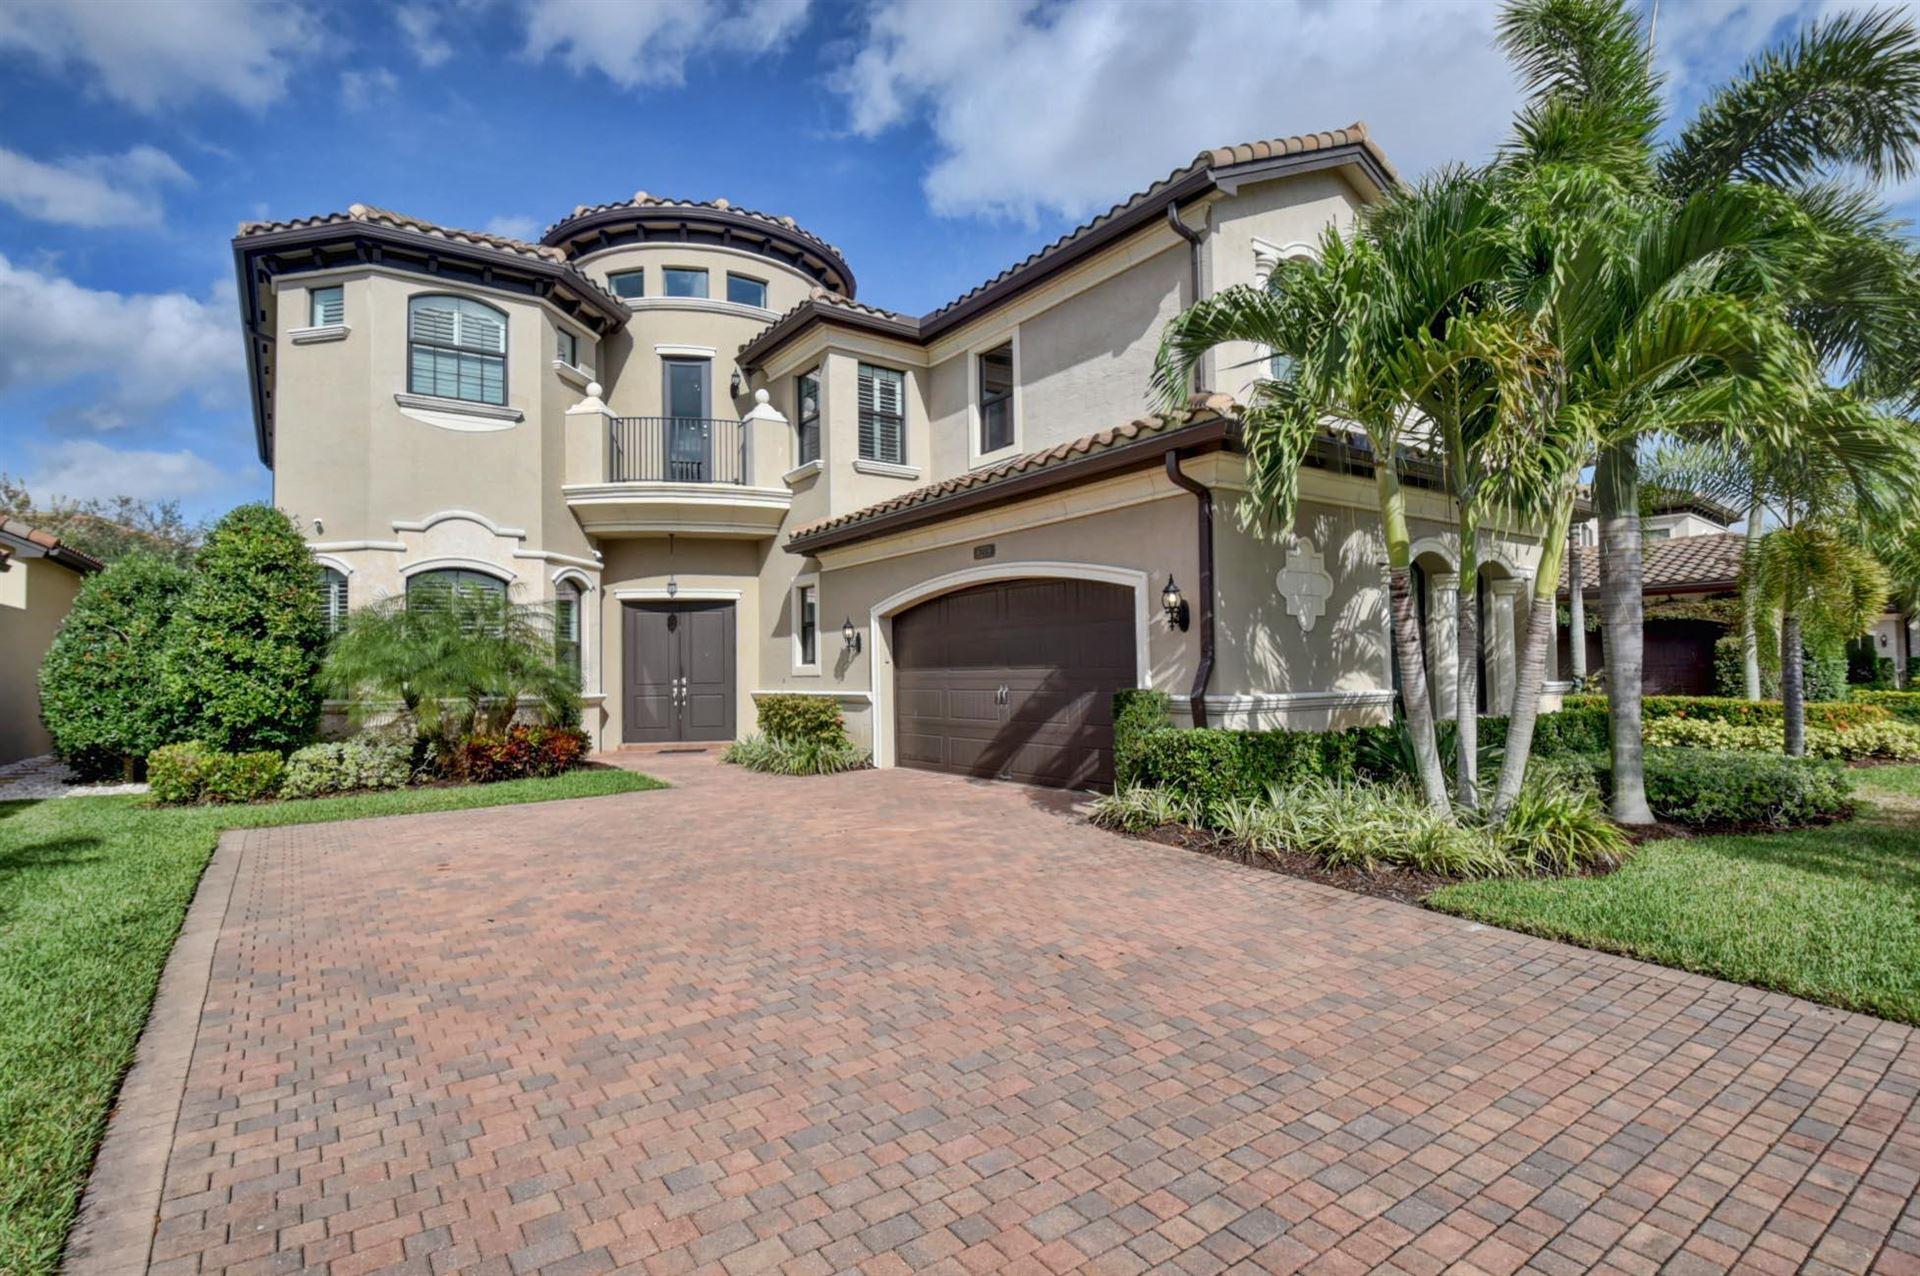 8279 Lost Creek Lane, Delray Beach, FL 33446 - #: RX-10589289